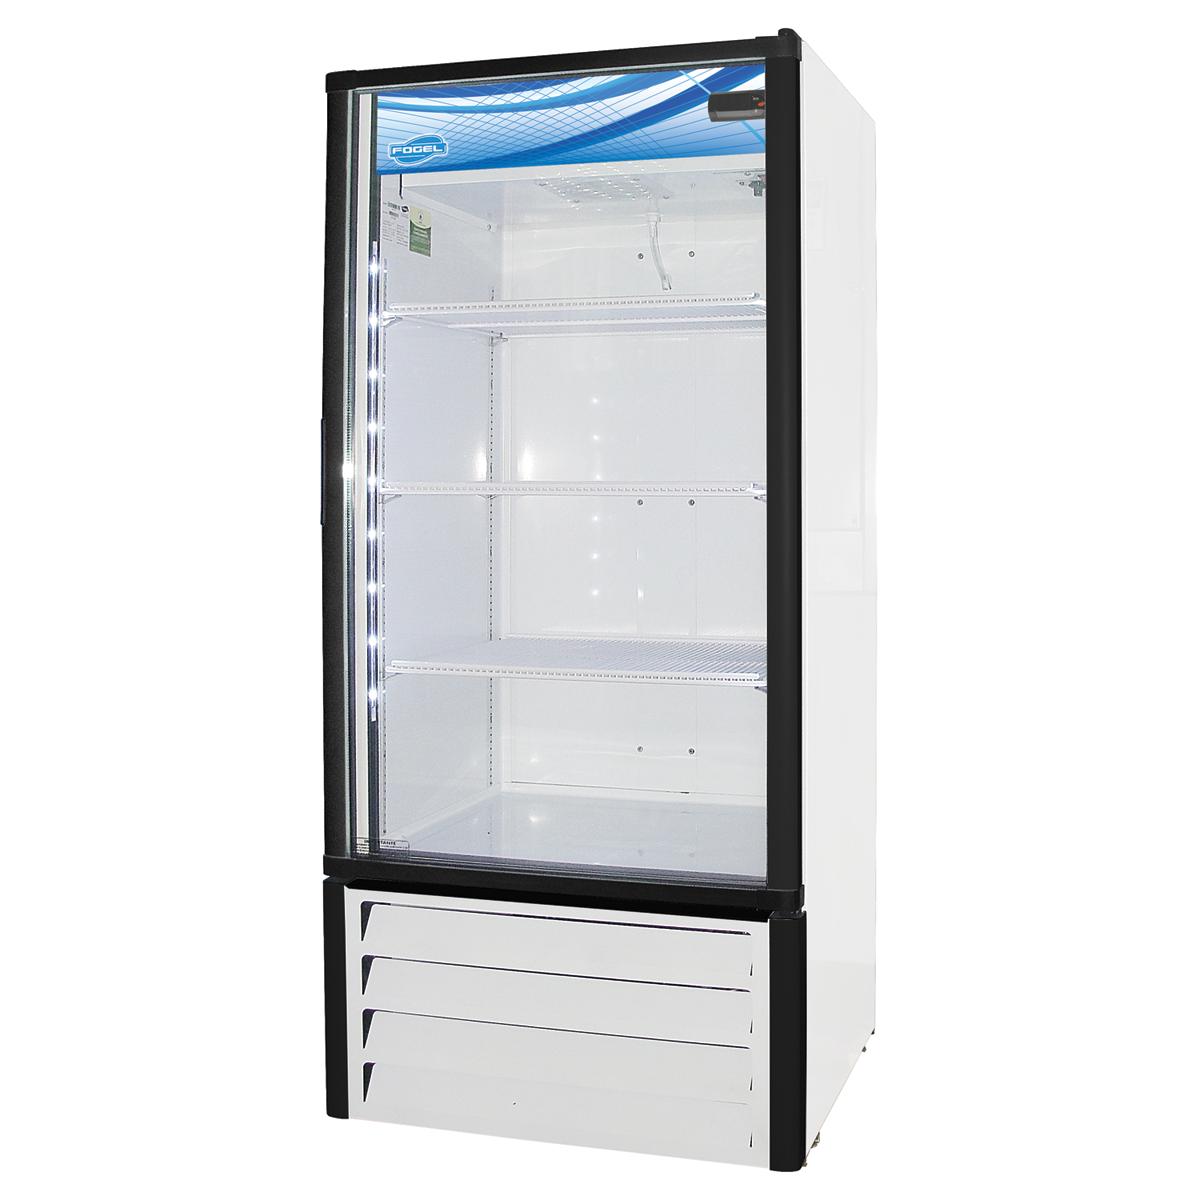 Fogel USA VR-15-HC refrigerator, merchandiser